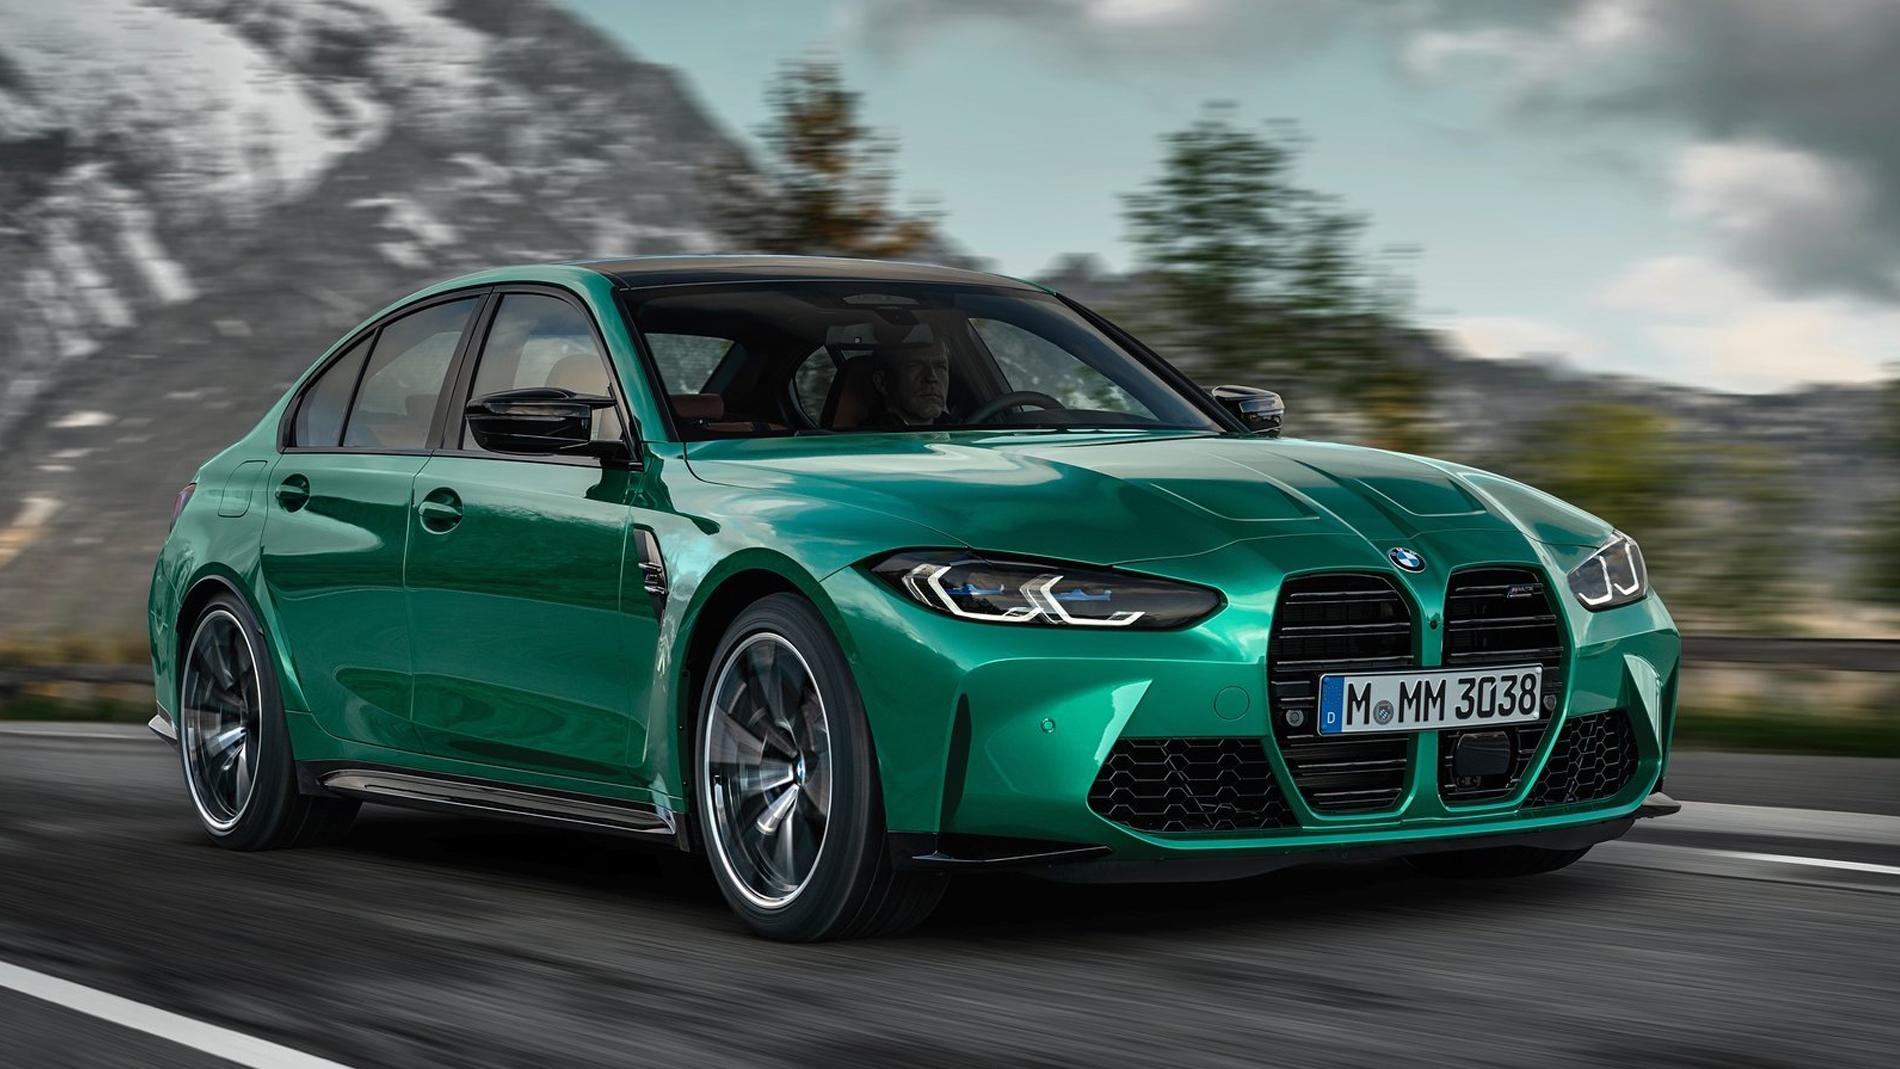 wp_m3_0004_BMW-M3_Sedan_Competition-2021-1600-18